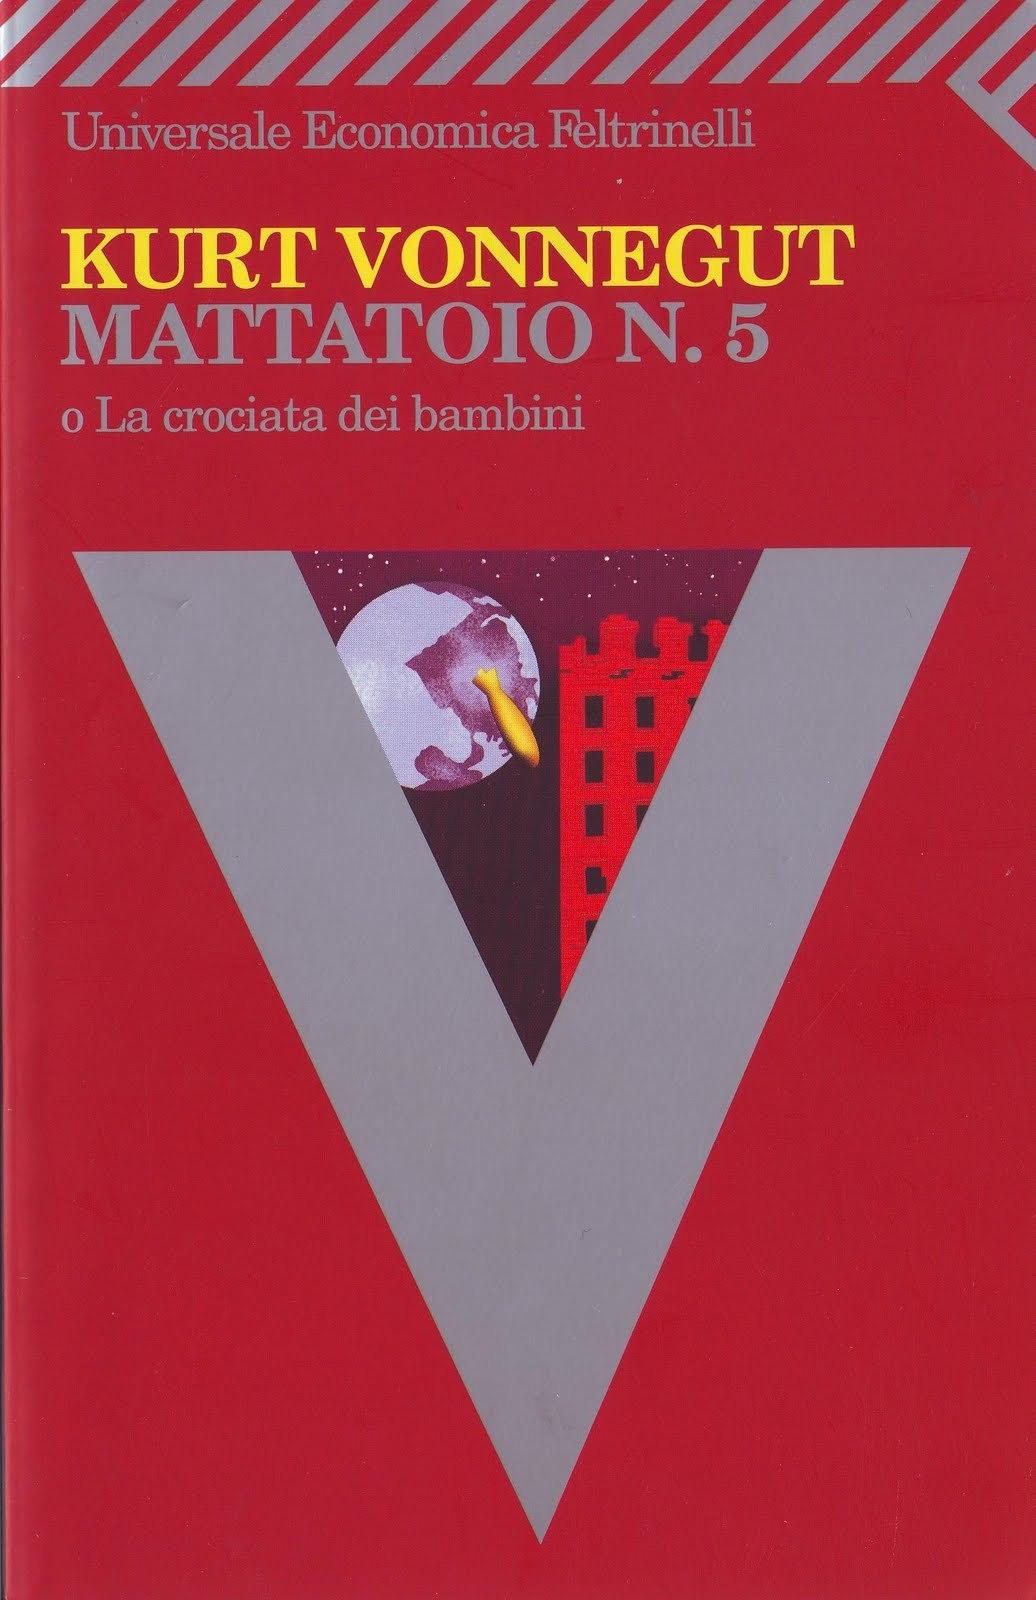 Mattatoio n. 5 o La crociata dei bambini